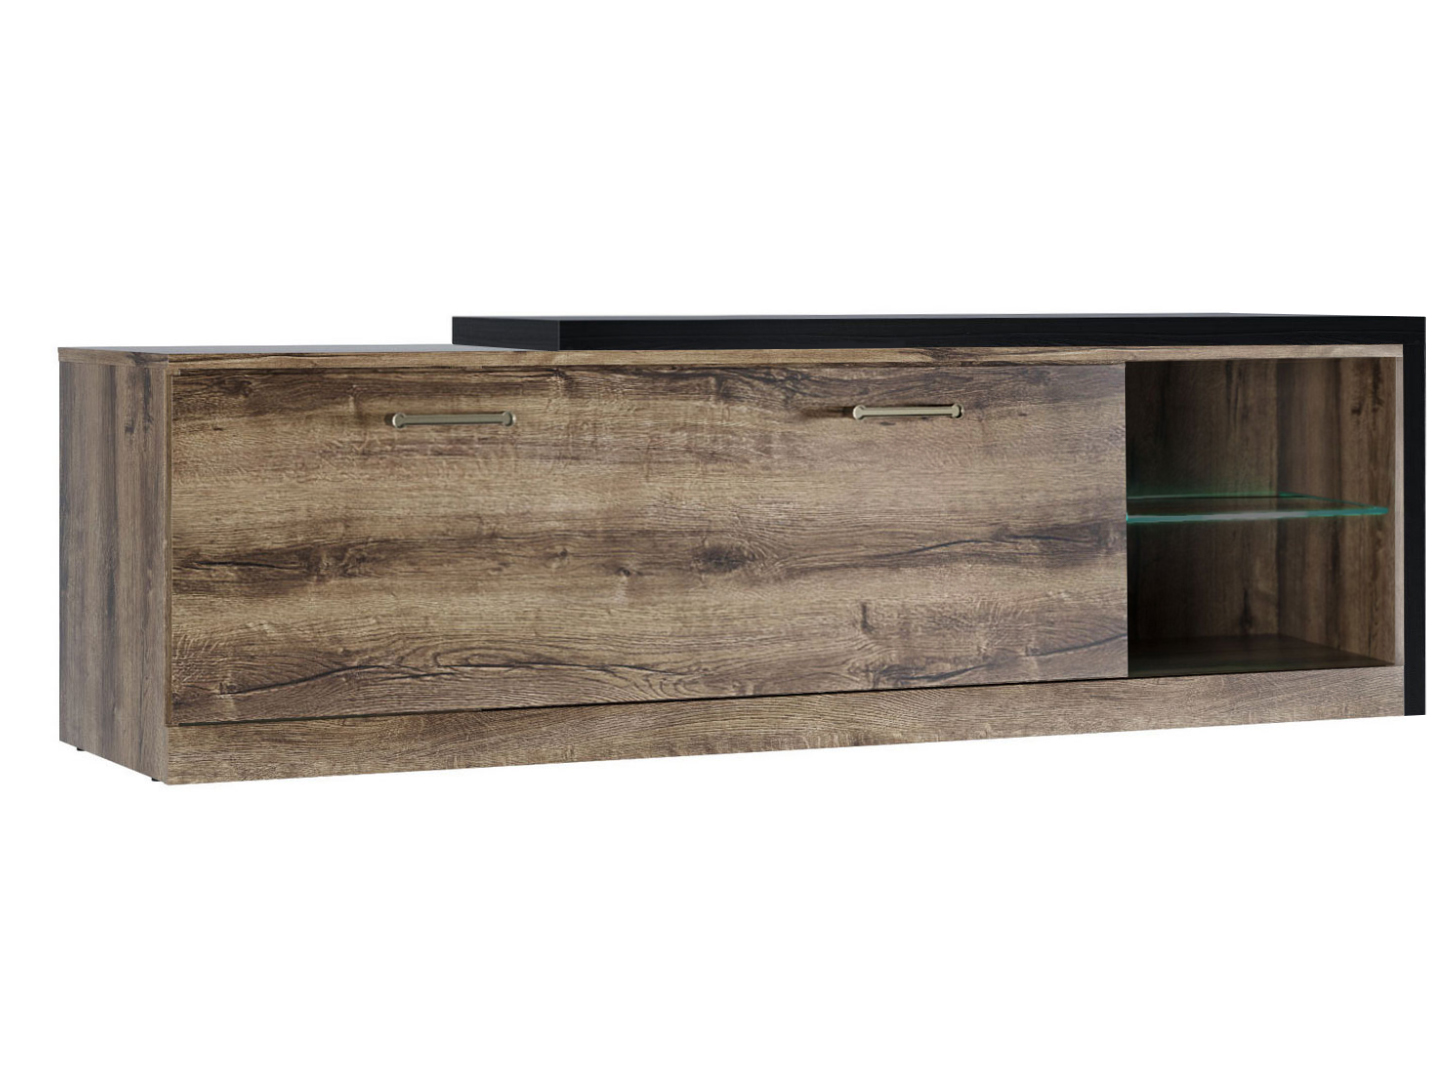 ТВ-тумба 150-95012